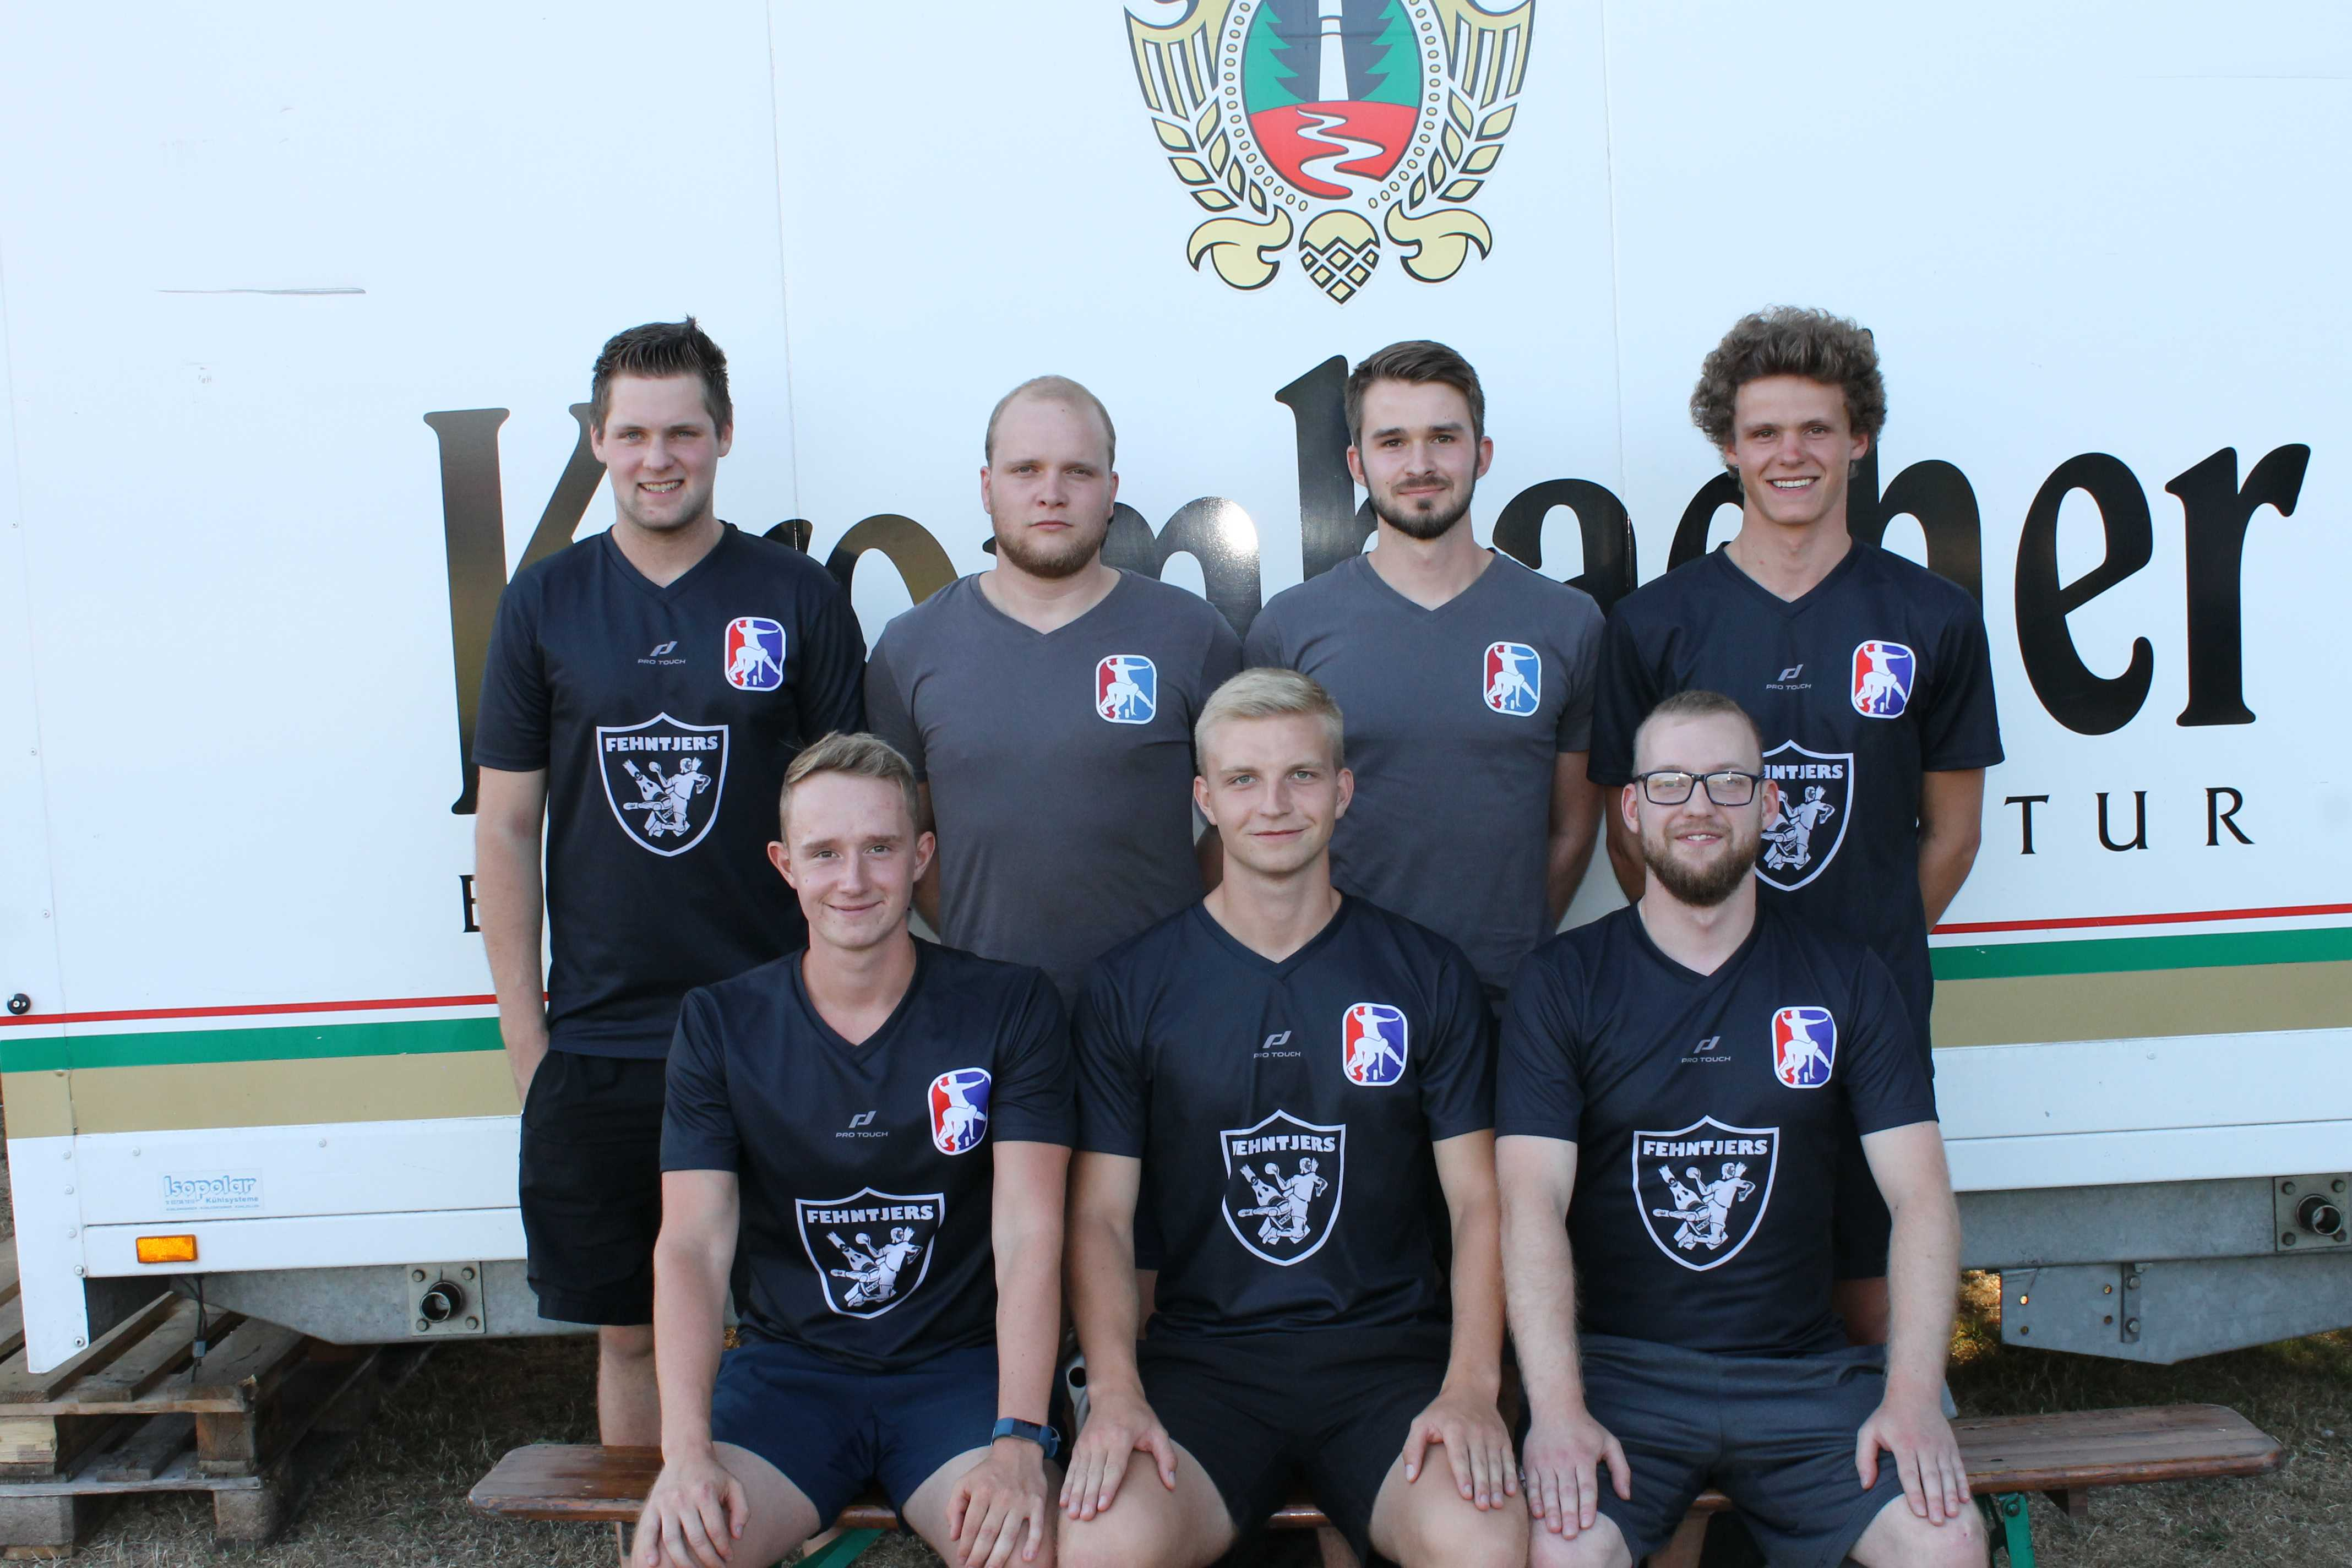 2018-07-27 Sportwoche - Flunkyball Turnier (1)